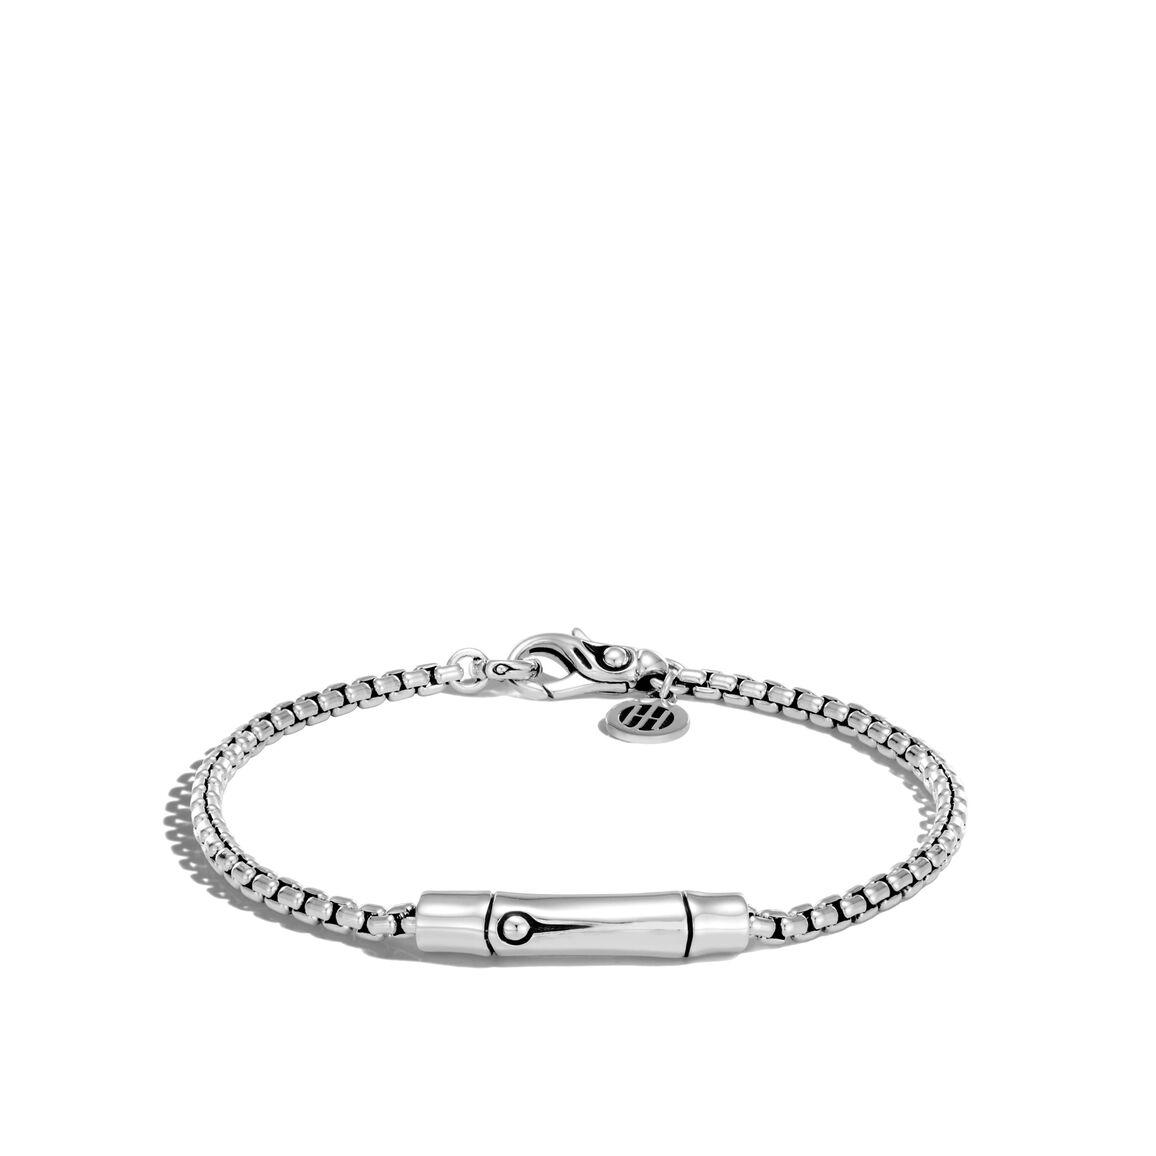 Bamboo 2.7MM Station Bracelet in Silver